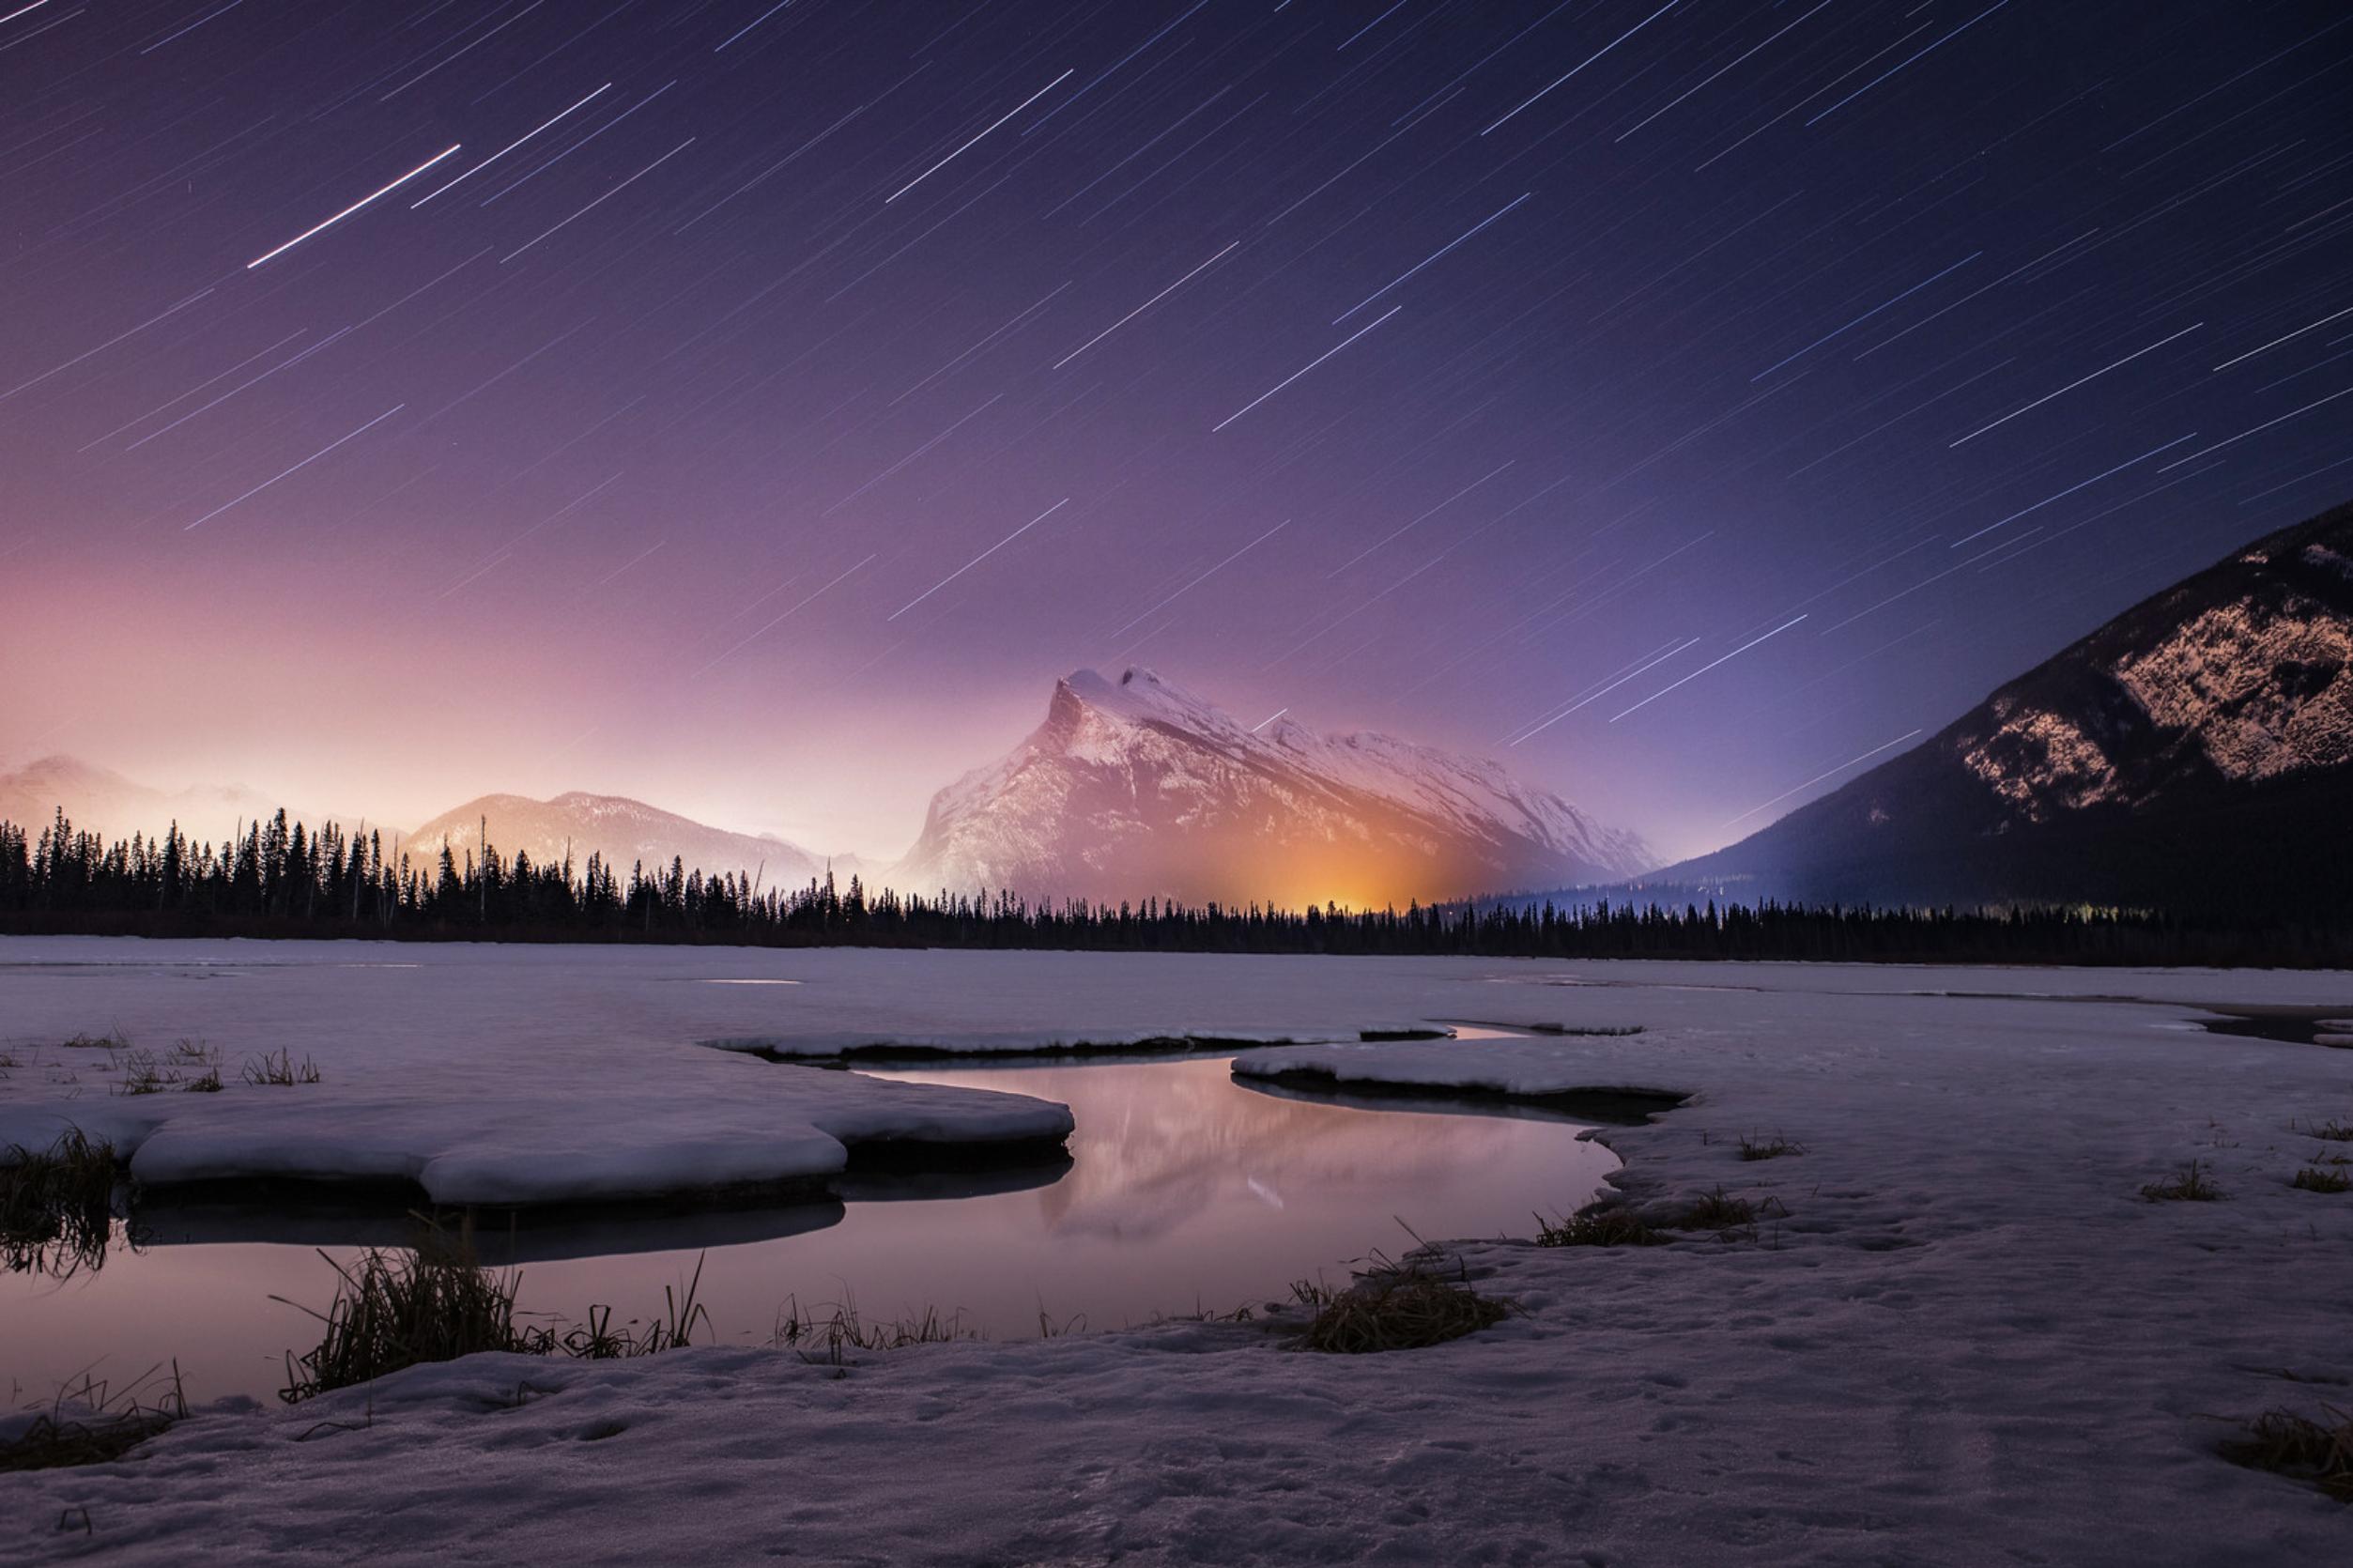 Zach Baranowski Photo Vermillion Lakes Banff National Park